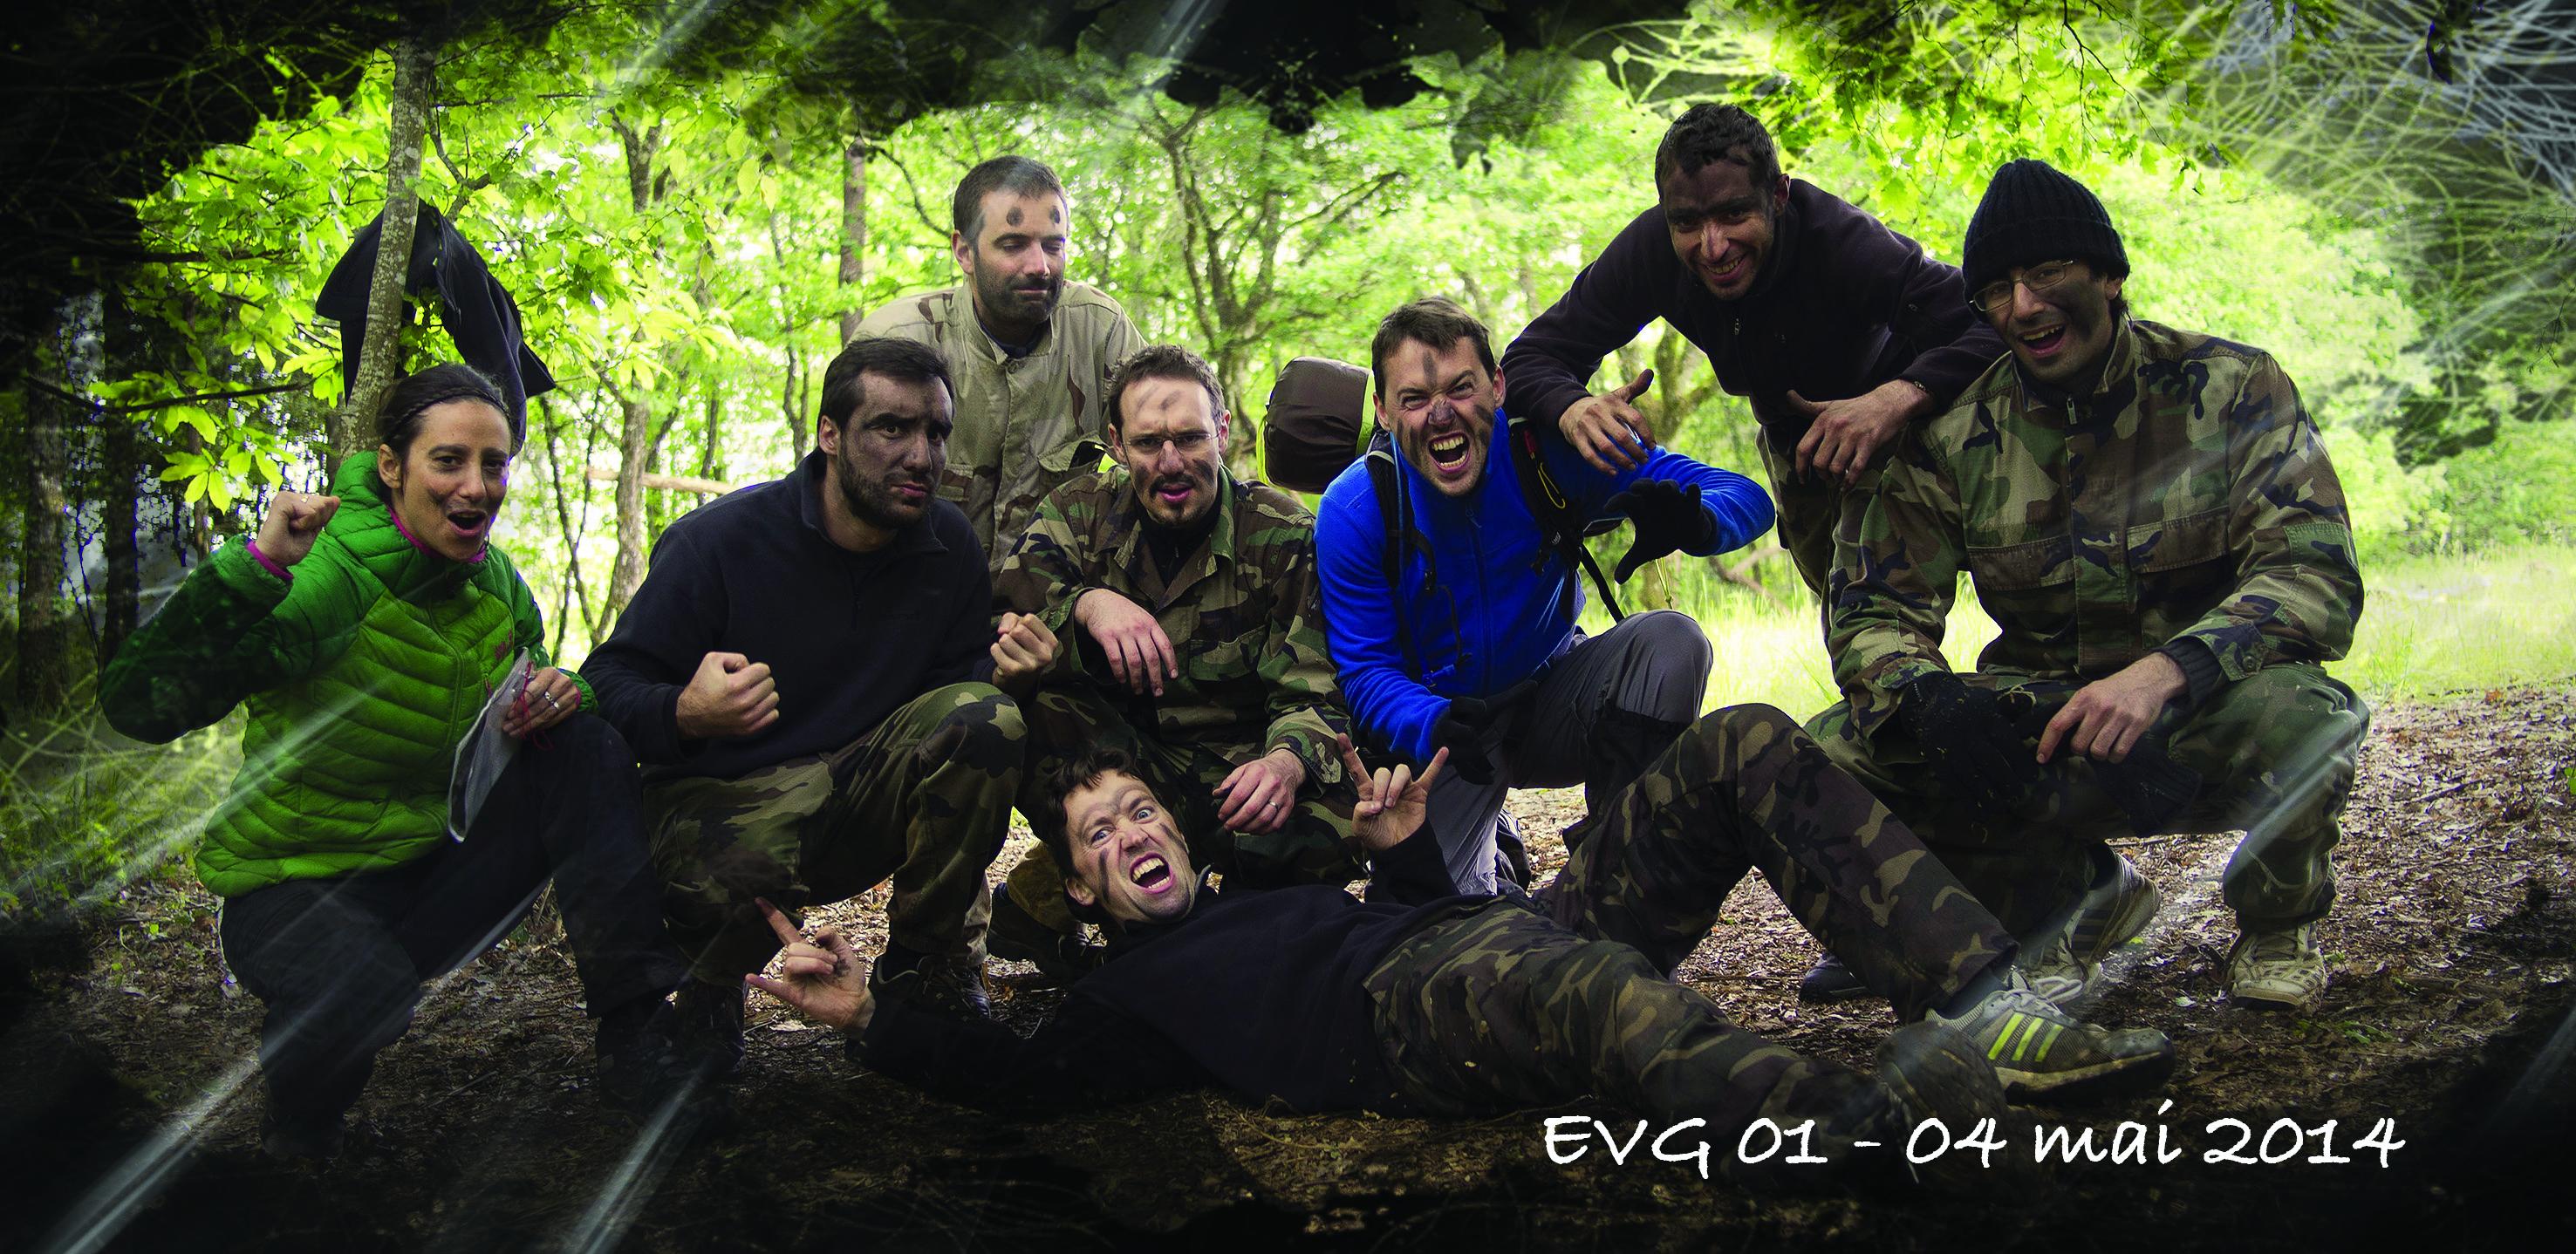 groupe evg 01-04 mai 2014.jpg